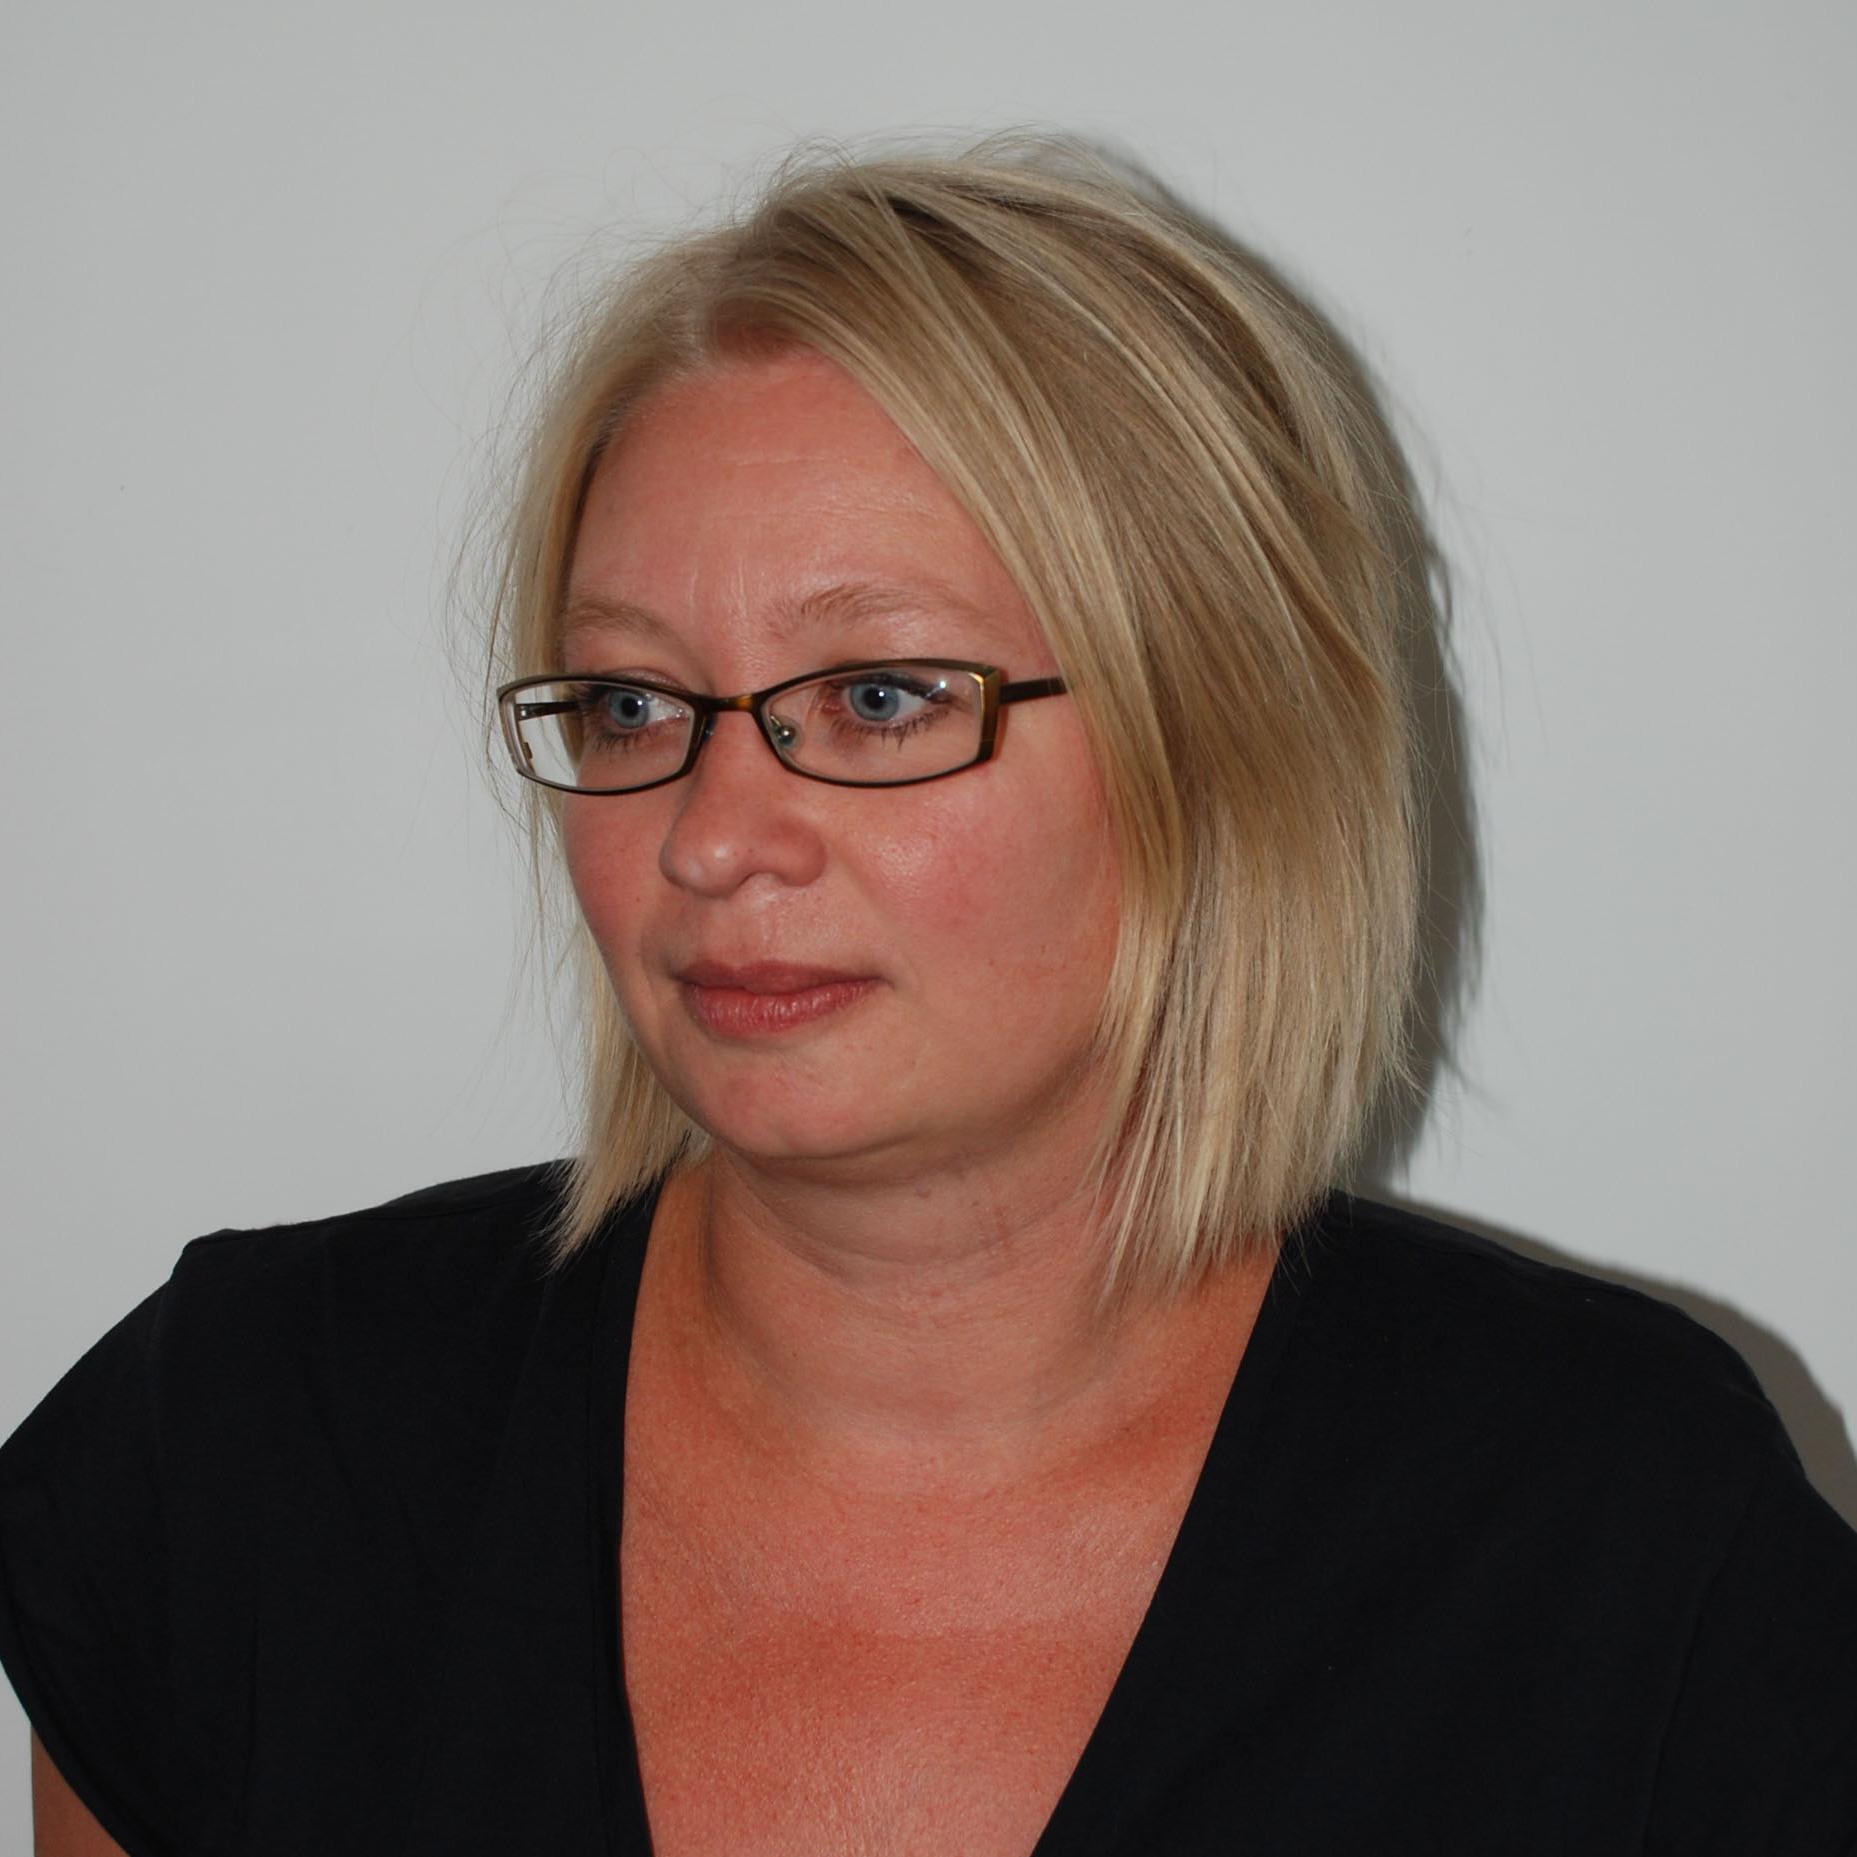 Marie Østergård